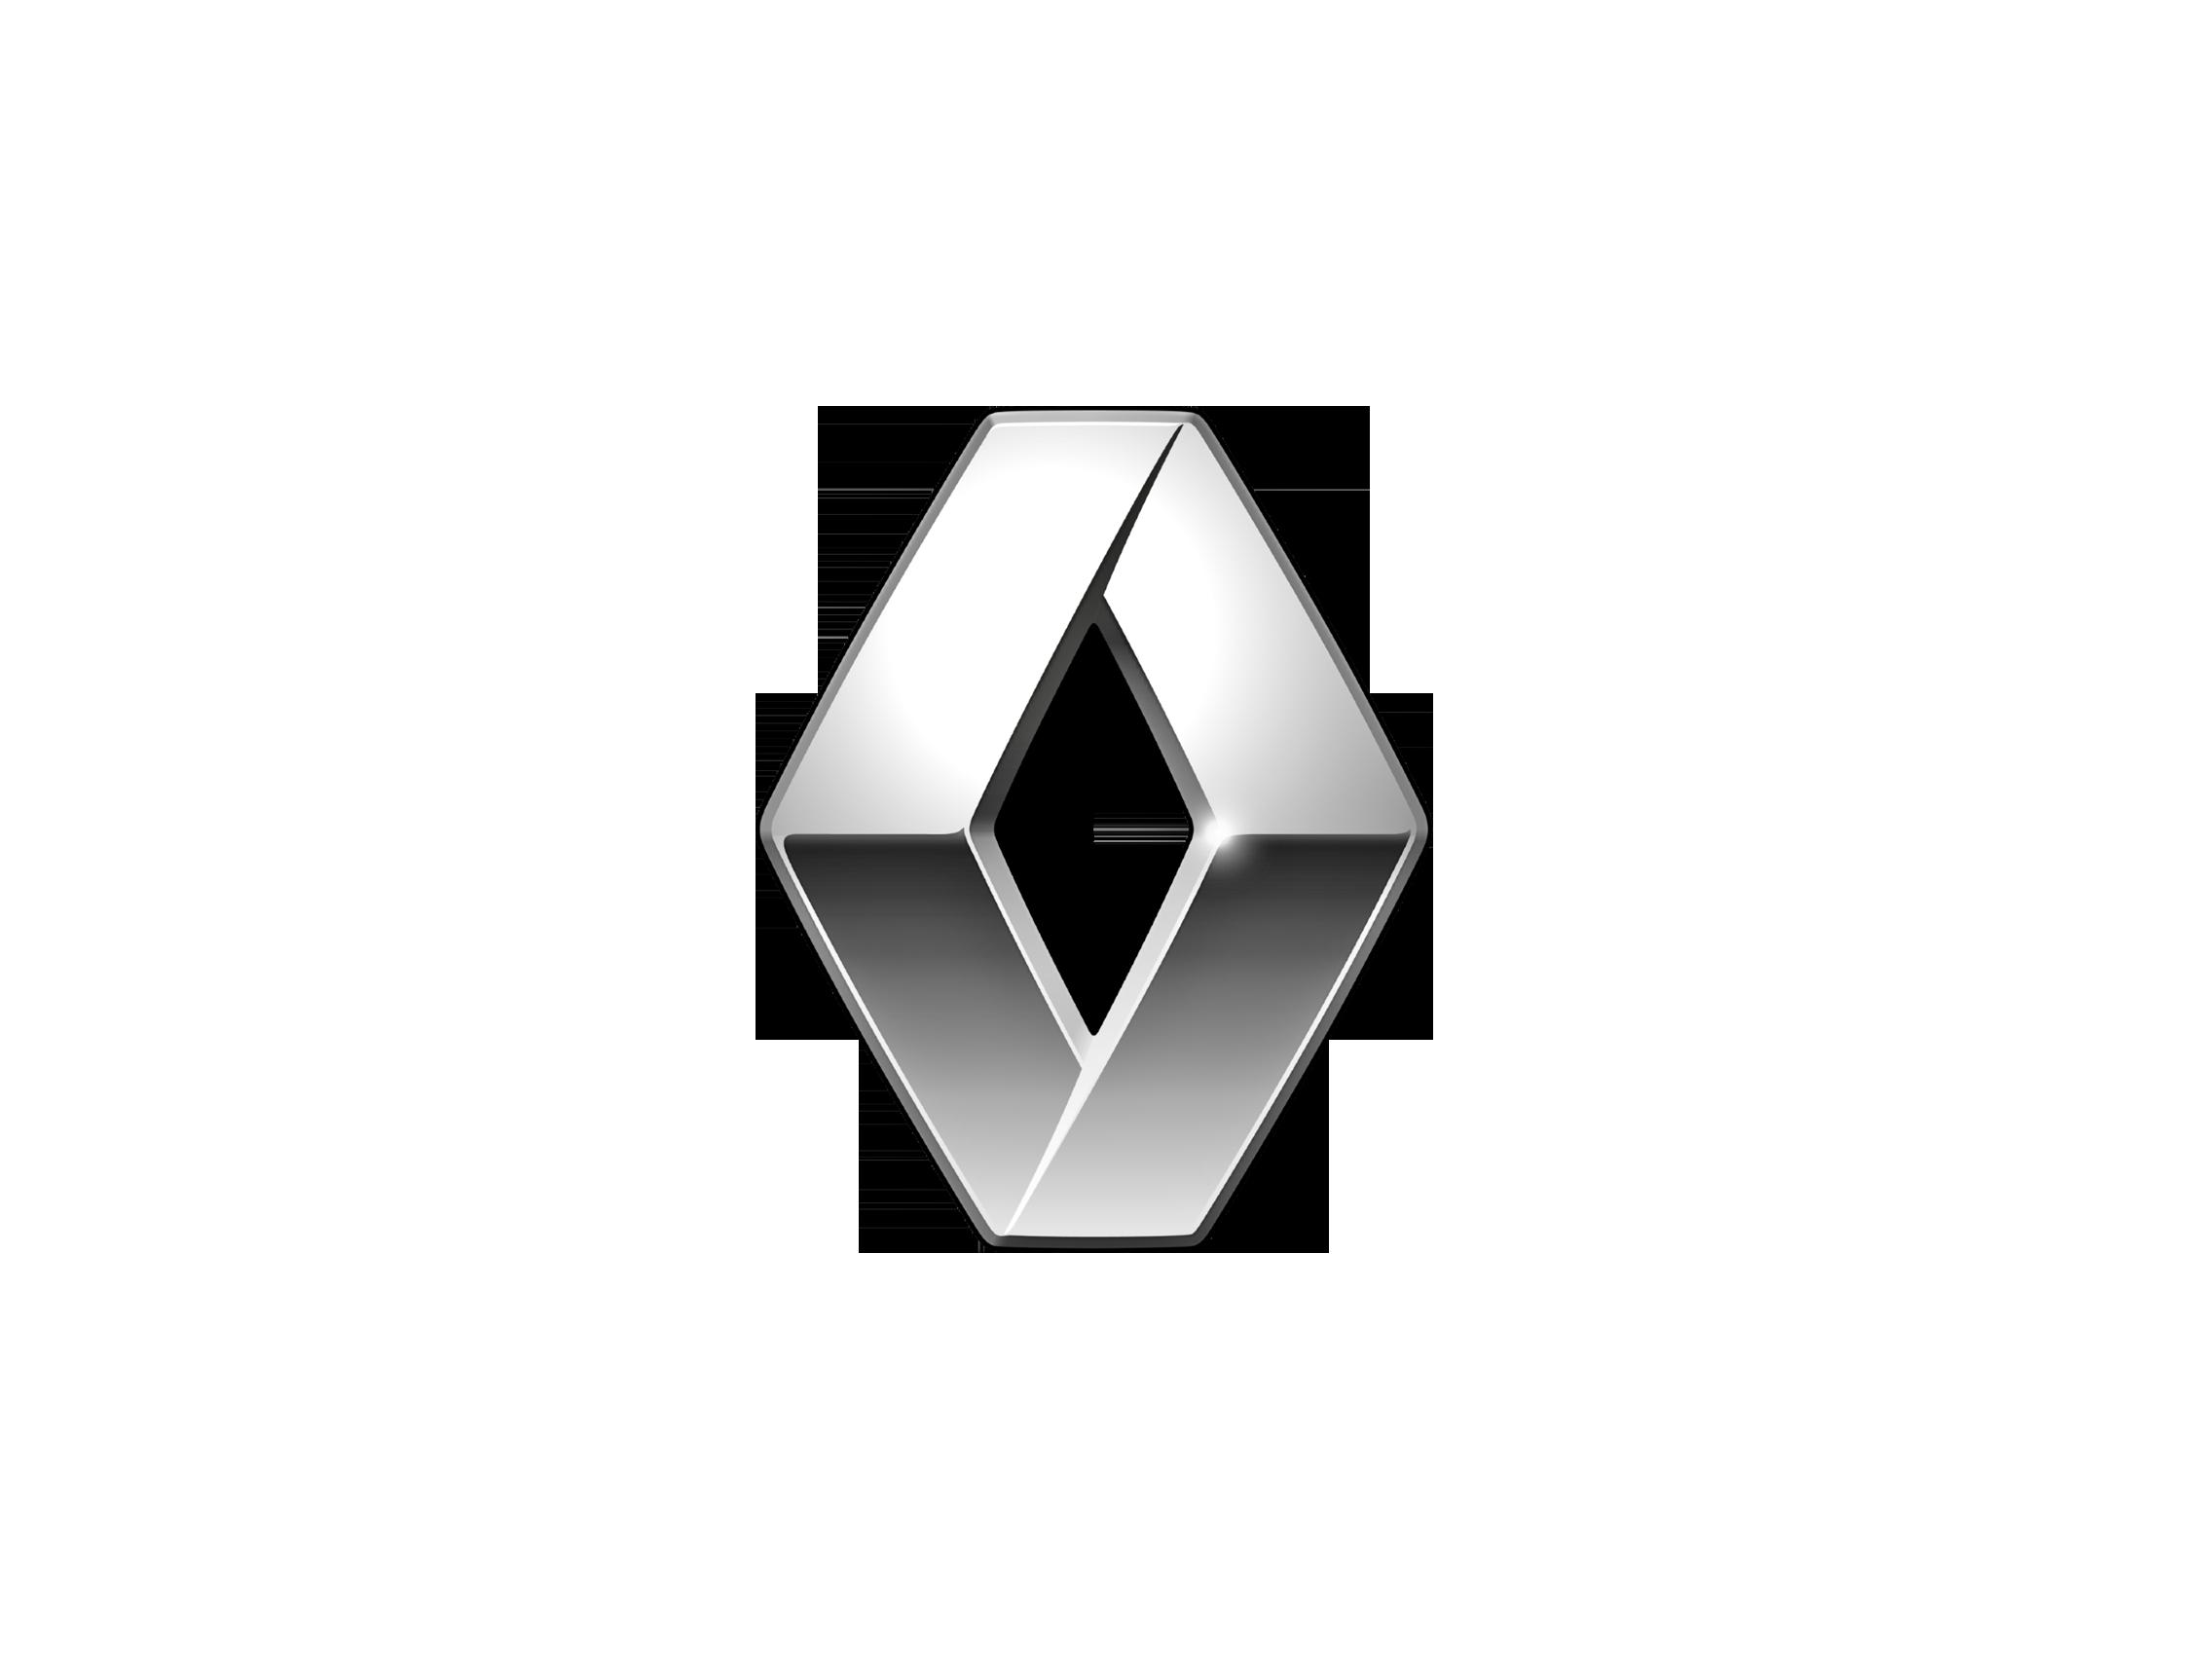 renault logo Google Search